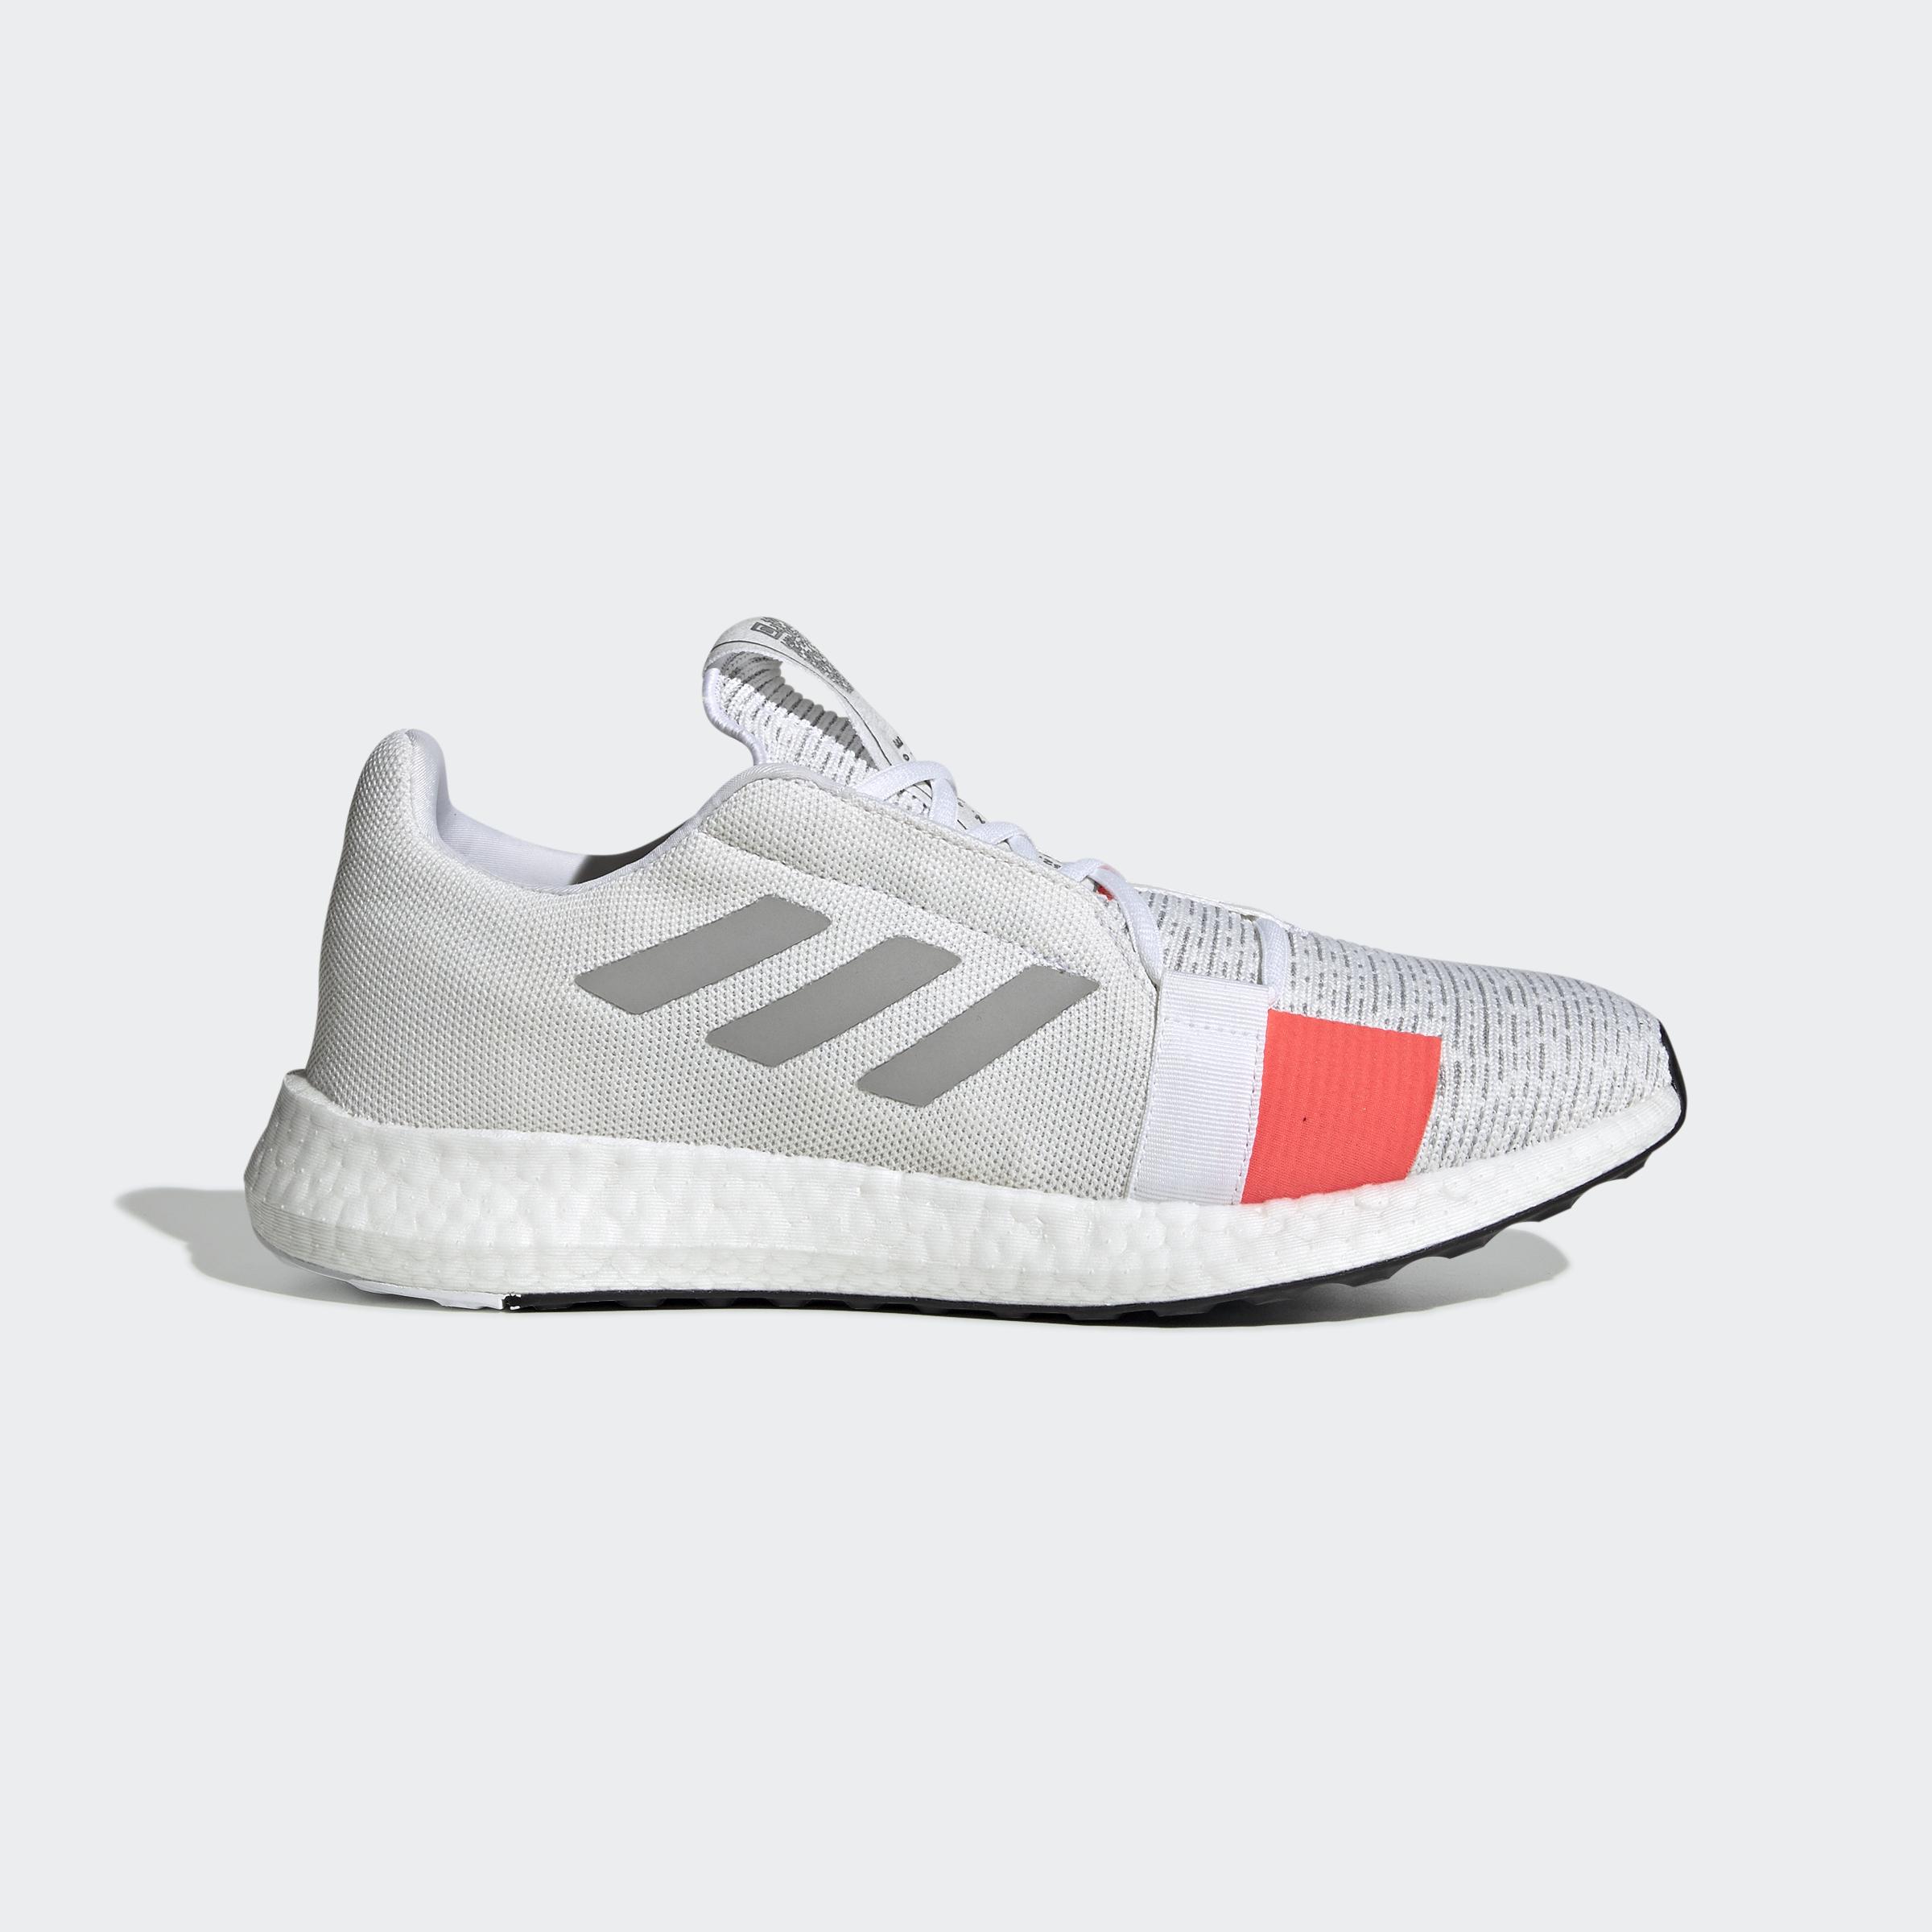 miniature 56 - adidas Senseboost Go Shoes Men's Athletic & Sneakers